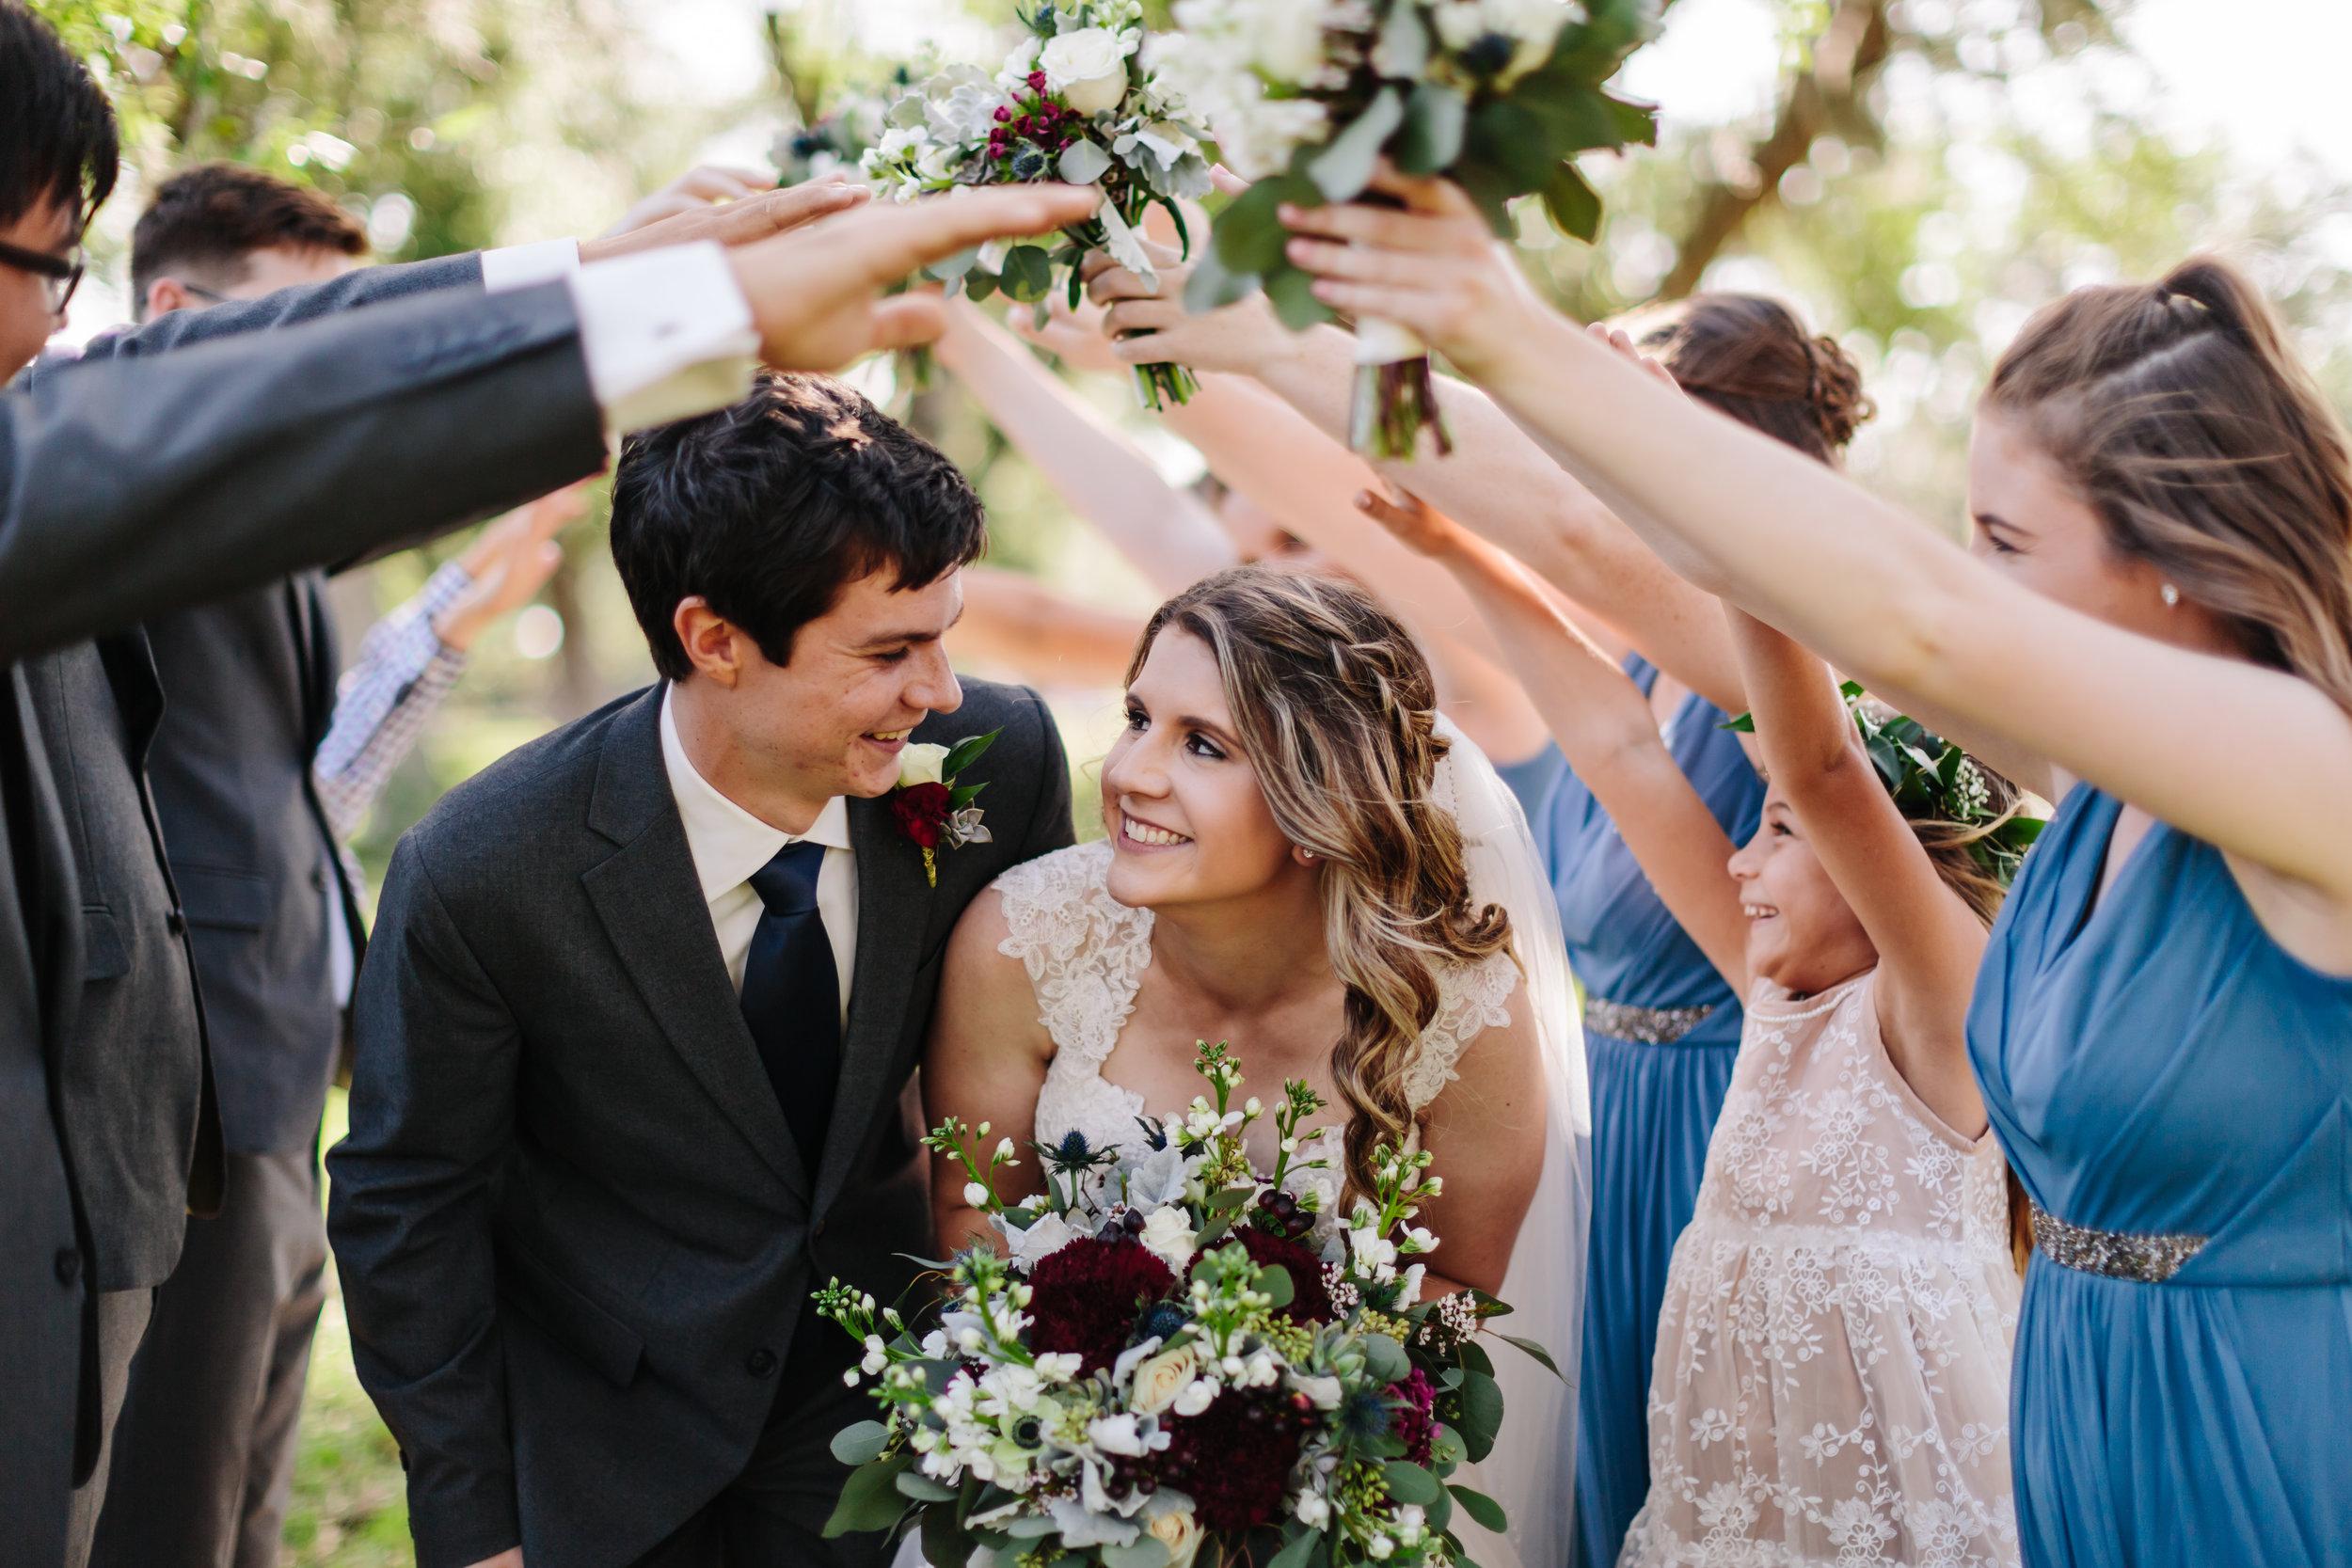 2018.04.14 Zak and Jamisyn Unrue Black Willow Barn Wedding Finals-522.jpg